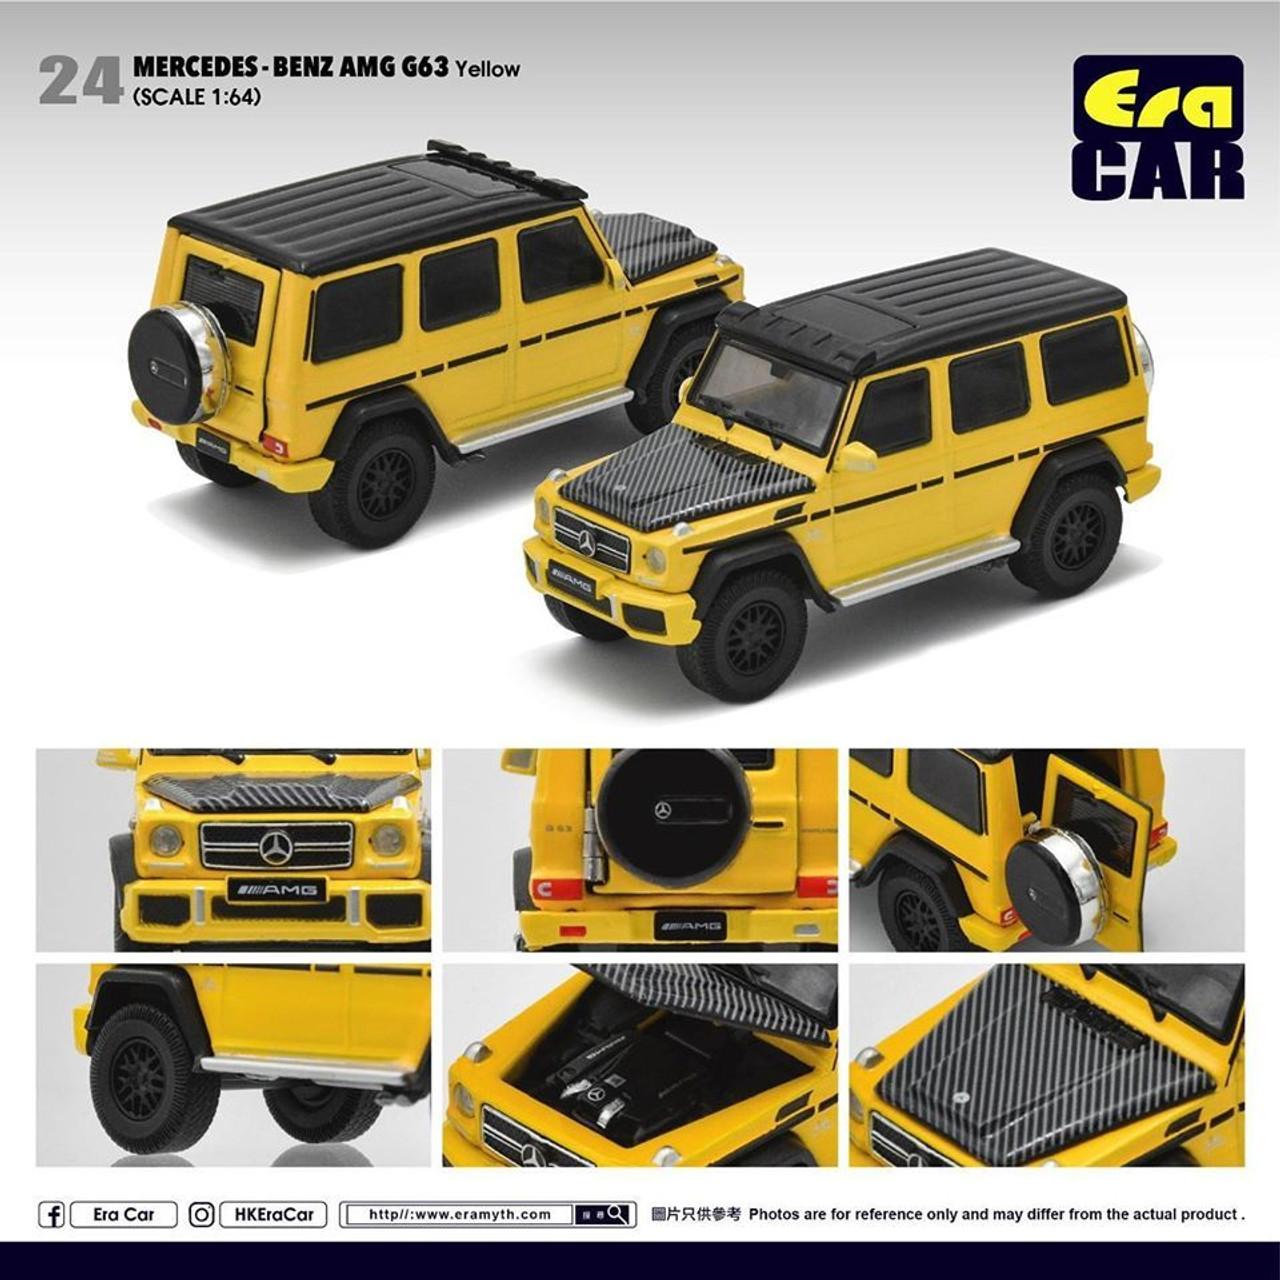 Era Car 024 1 64 Mercedes Benz Amg G63 Spotlight Yellow Diecast Toy Car Buymarket Store